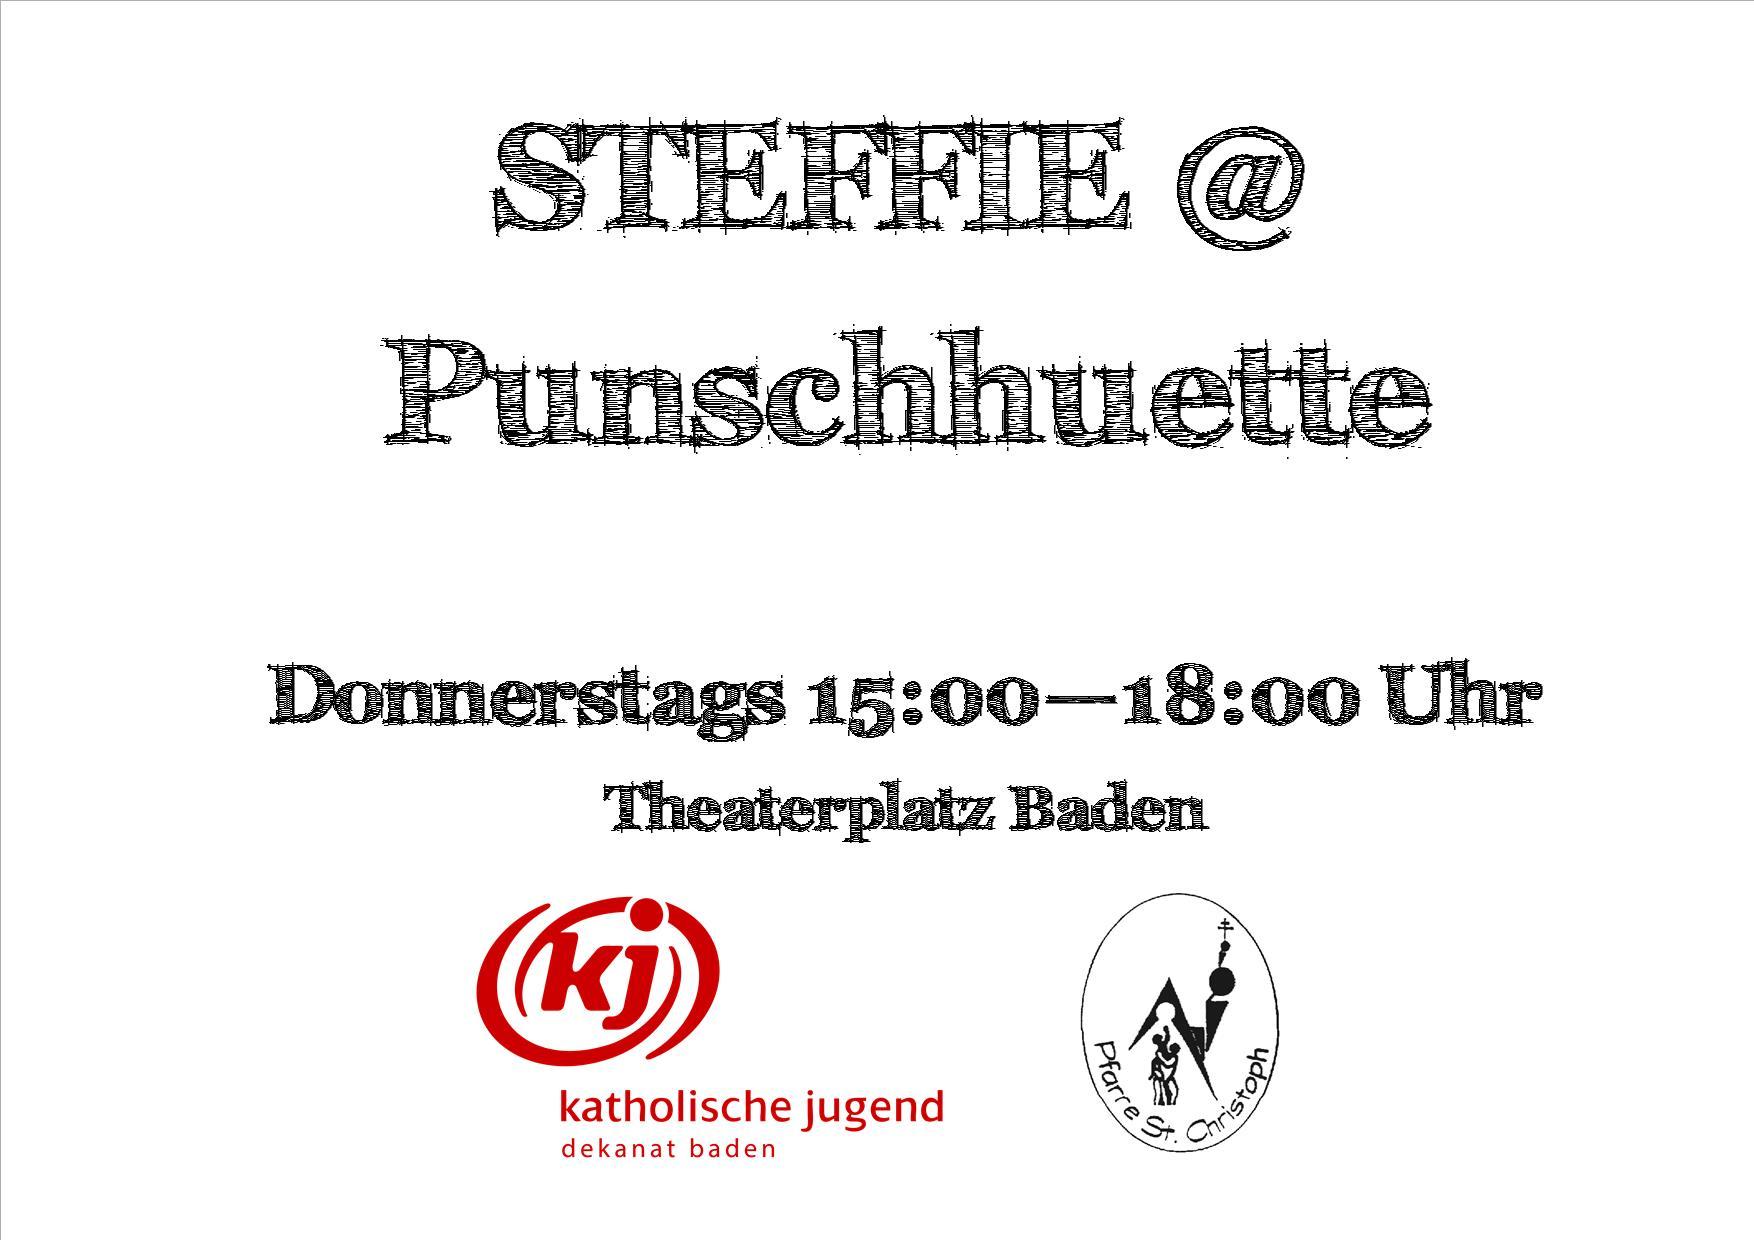 steffie_punschhuette